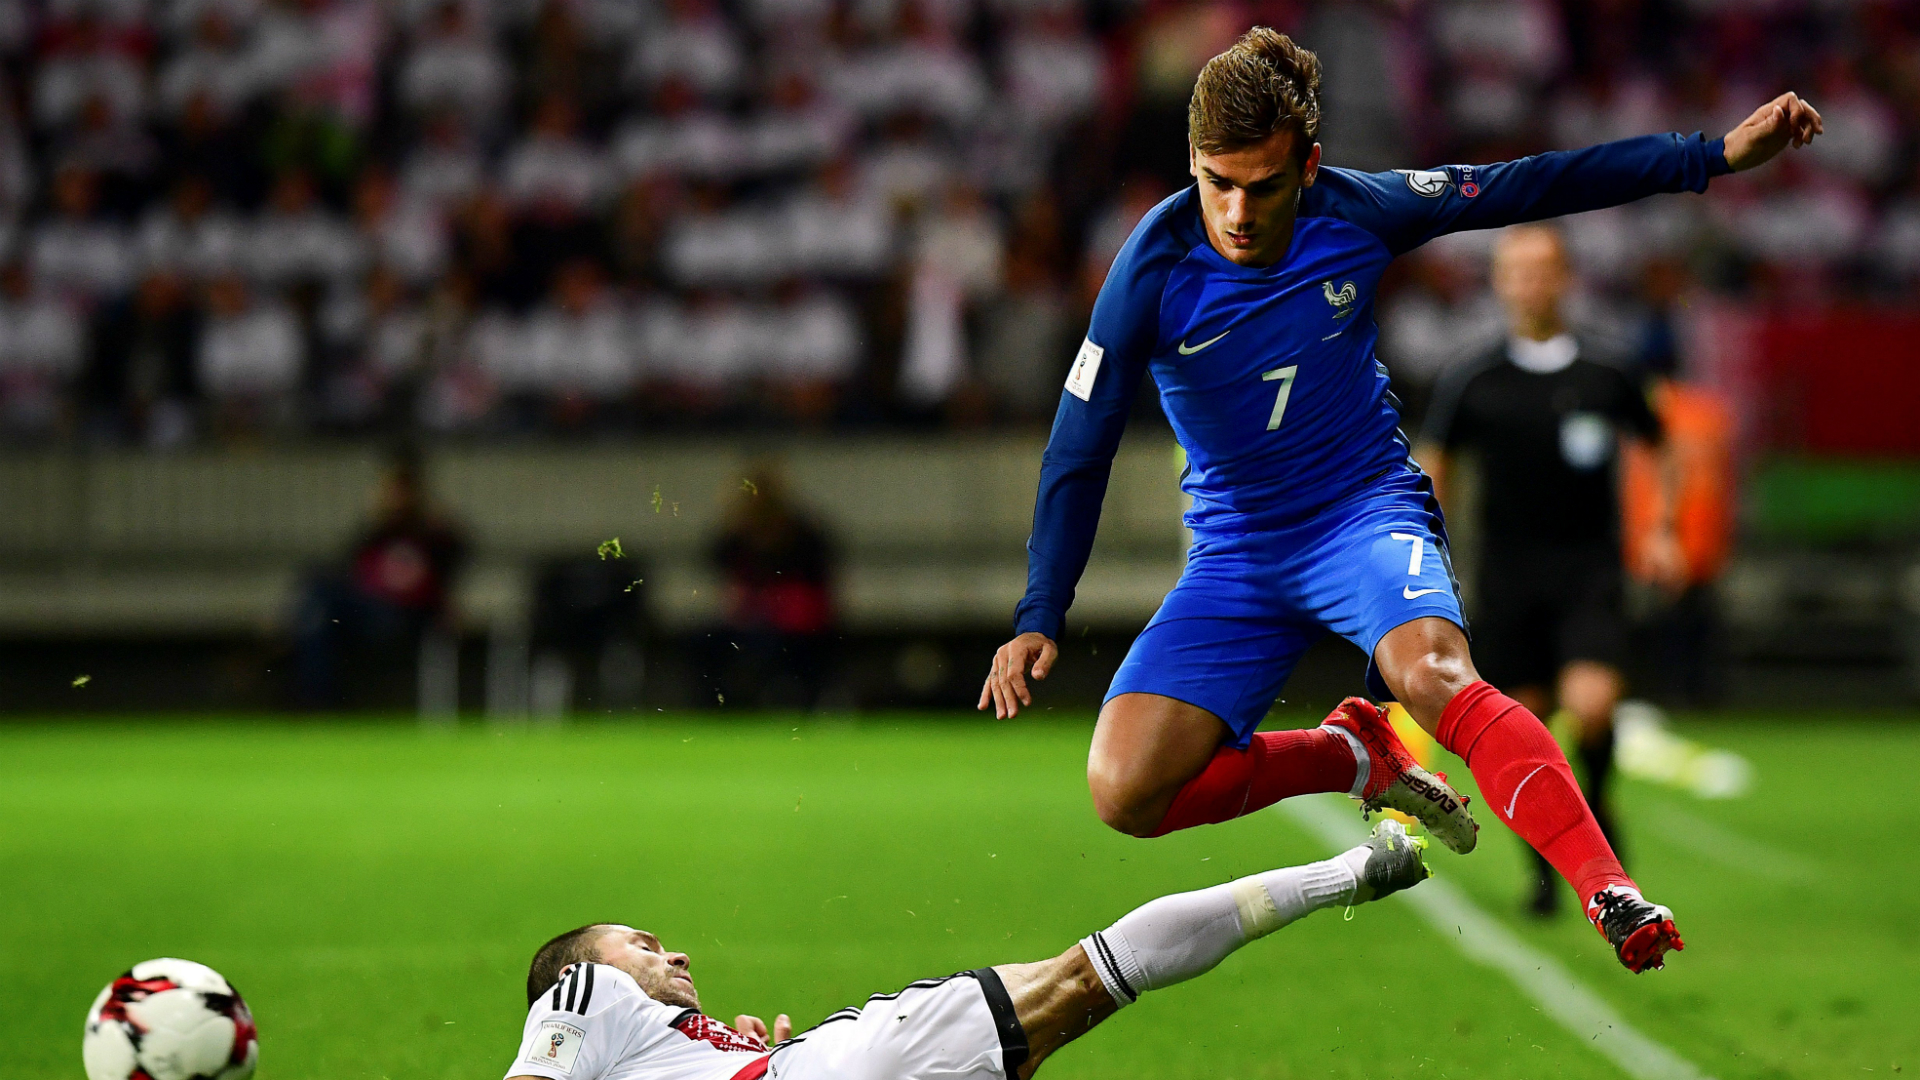 France will not take Belarus lightly: Giroud